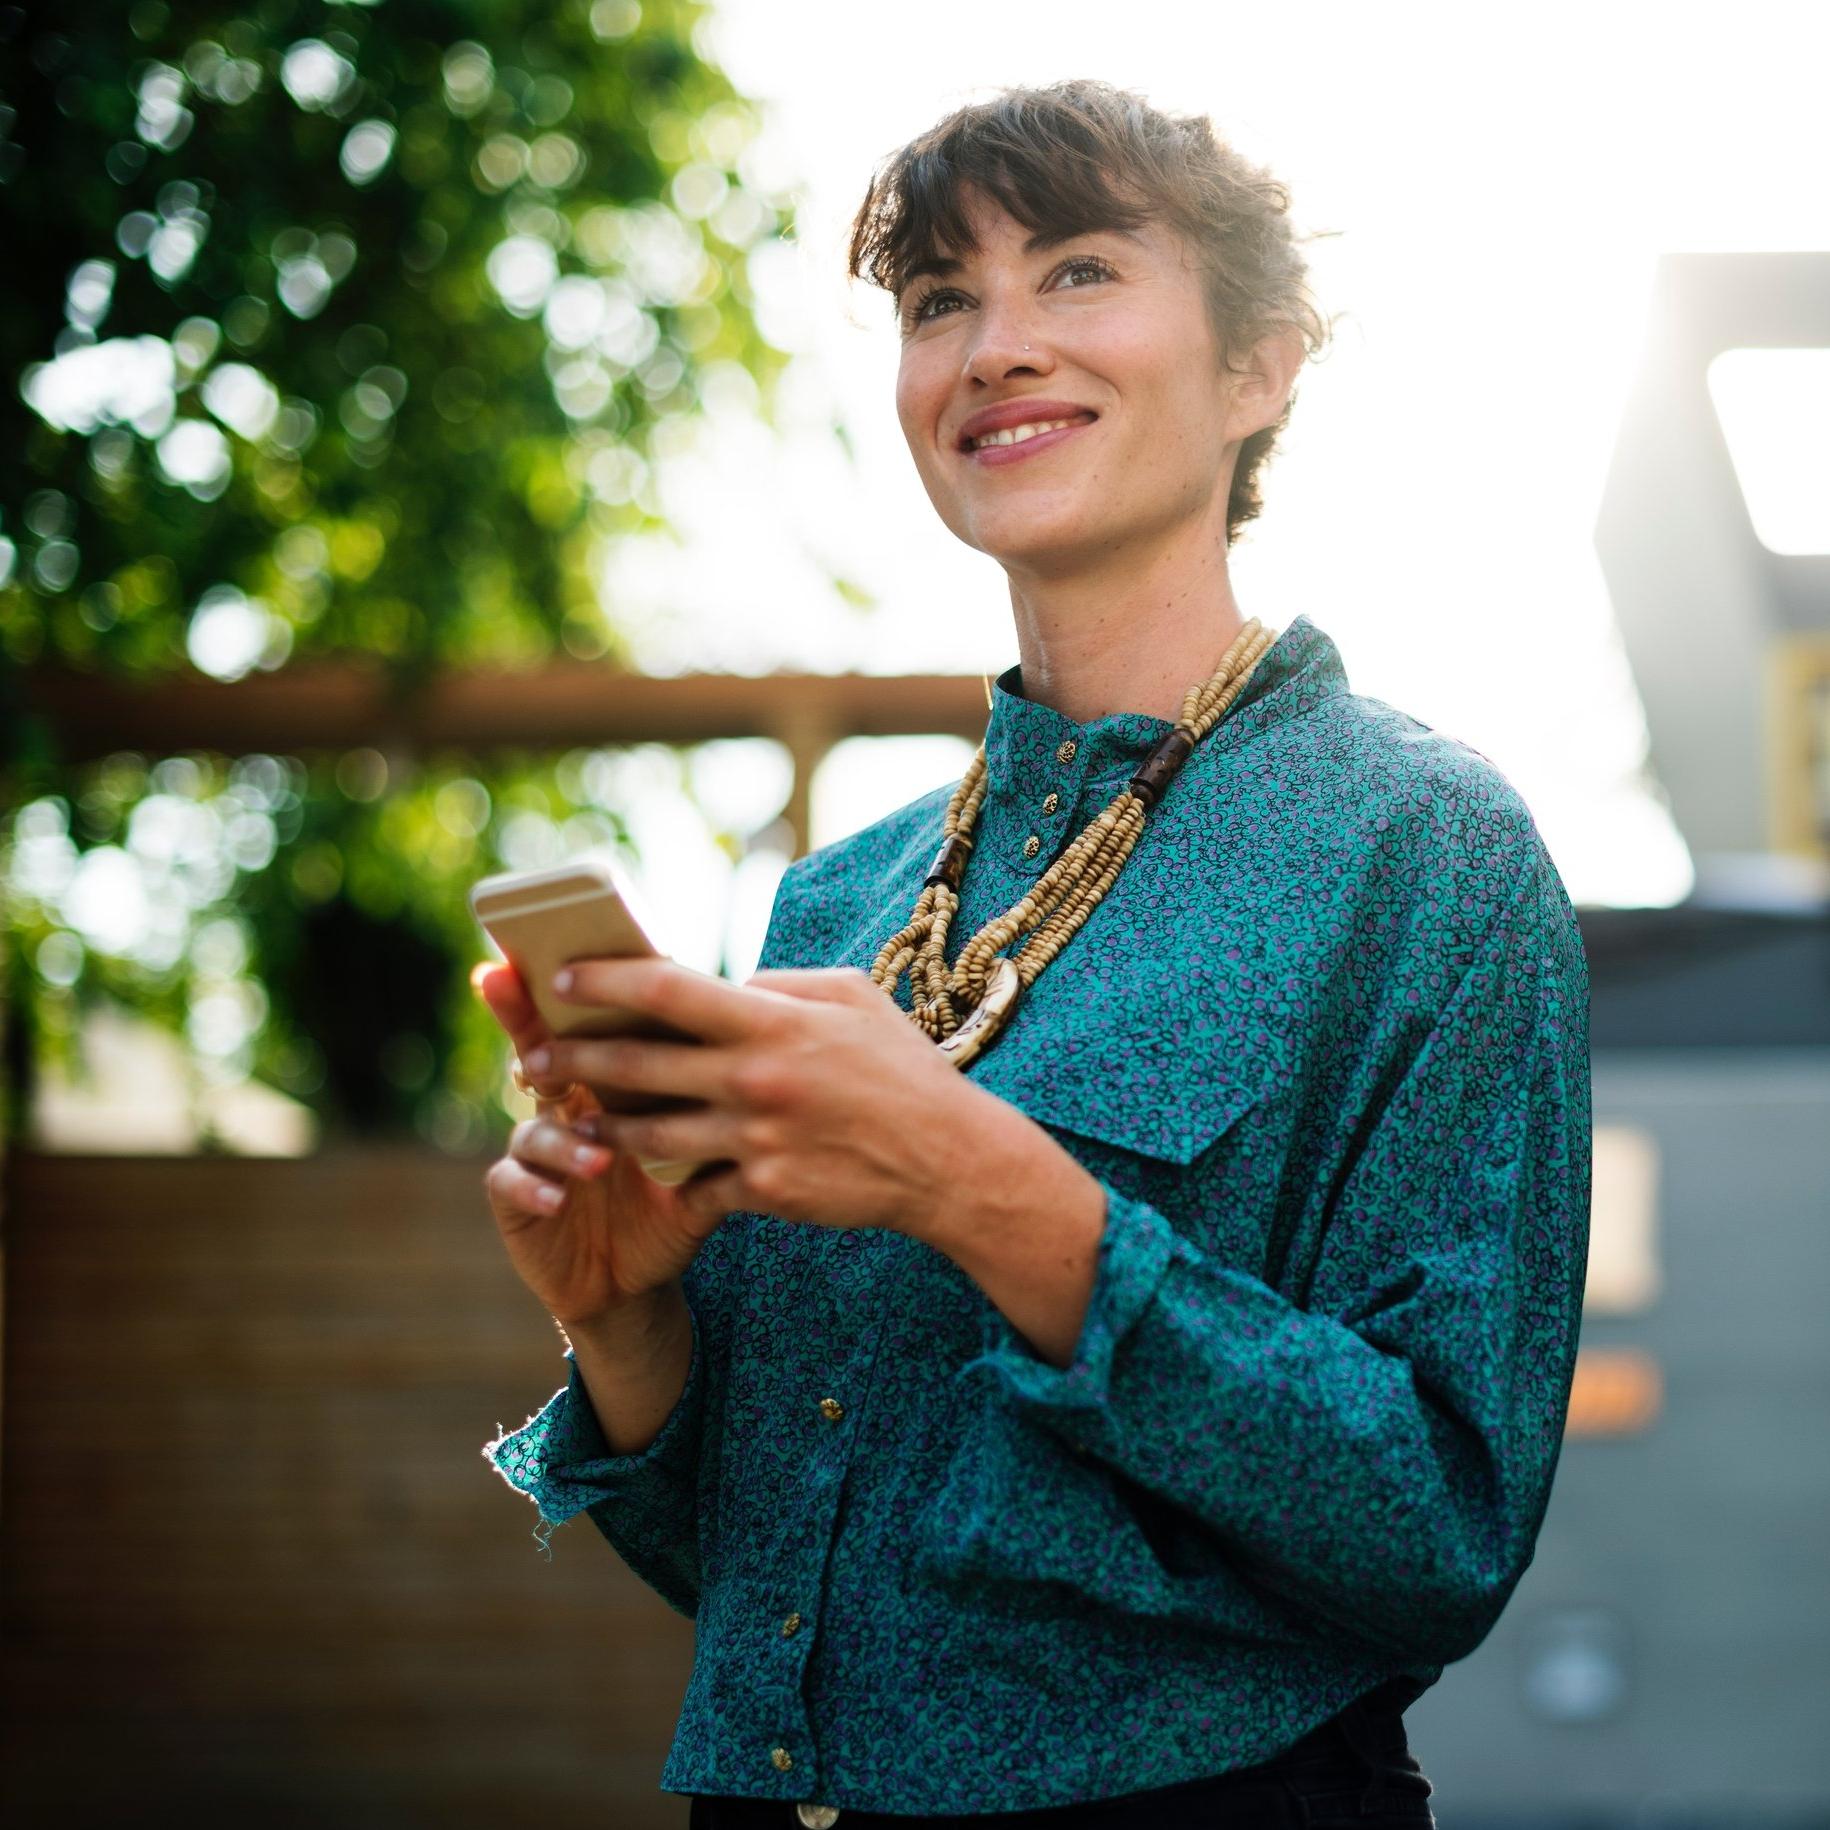 Woman with phone - rawpixel-com.jpg